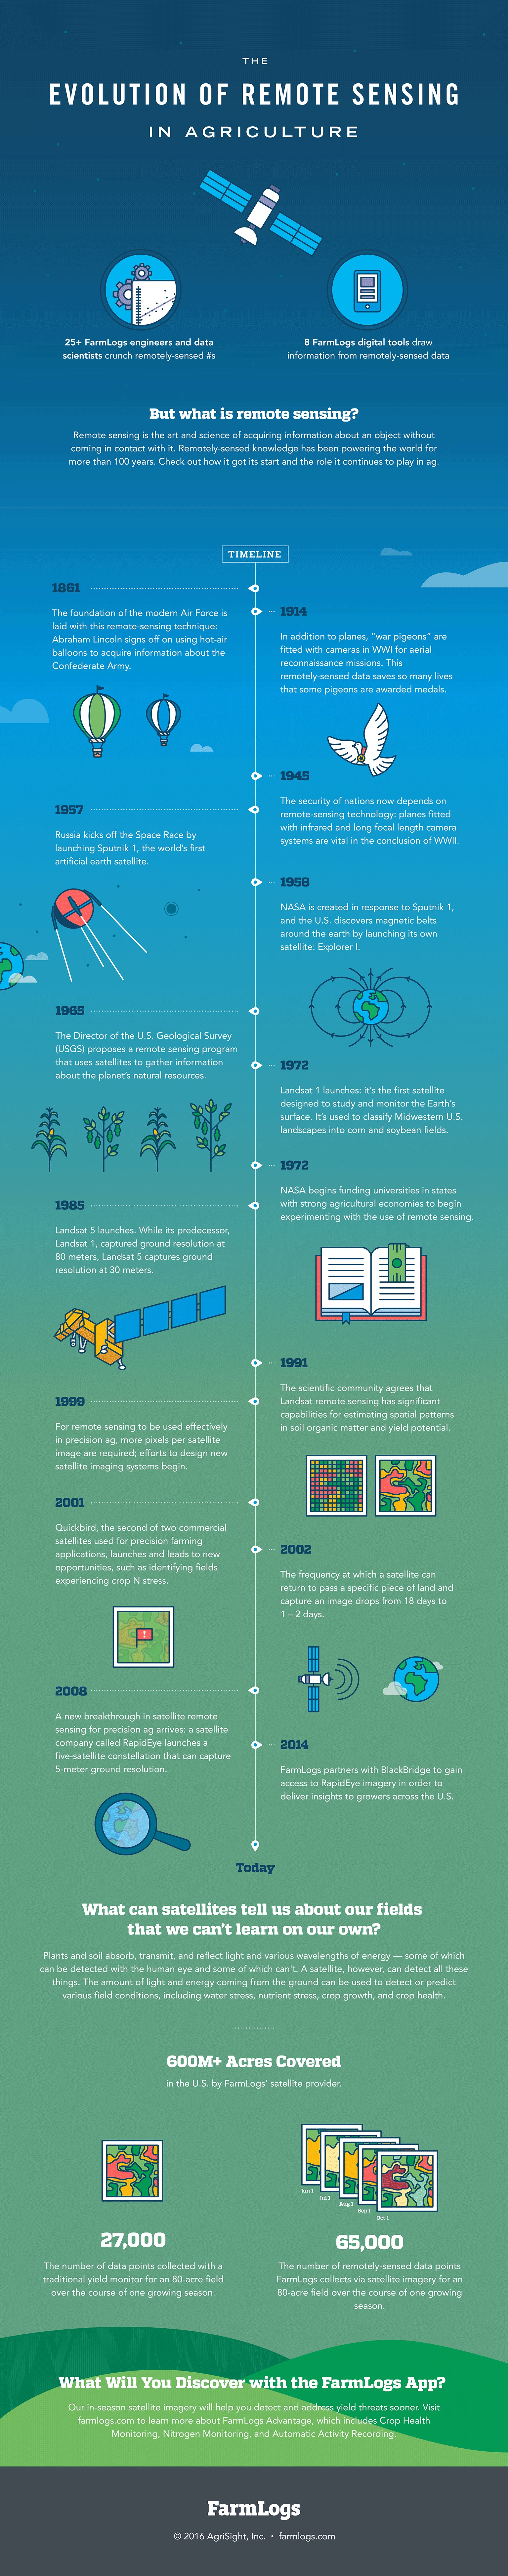 farmlogs_infographic.jpg